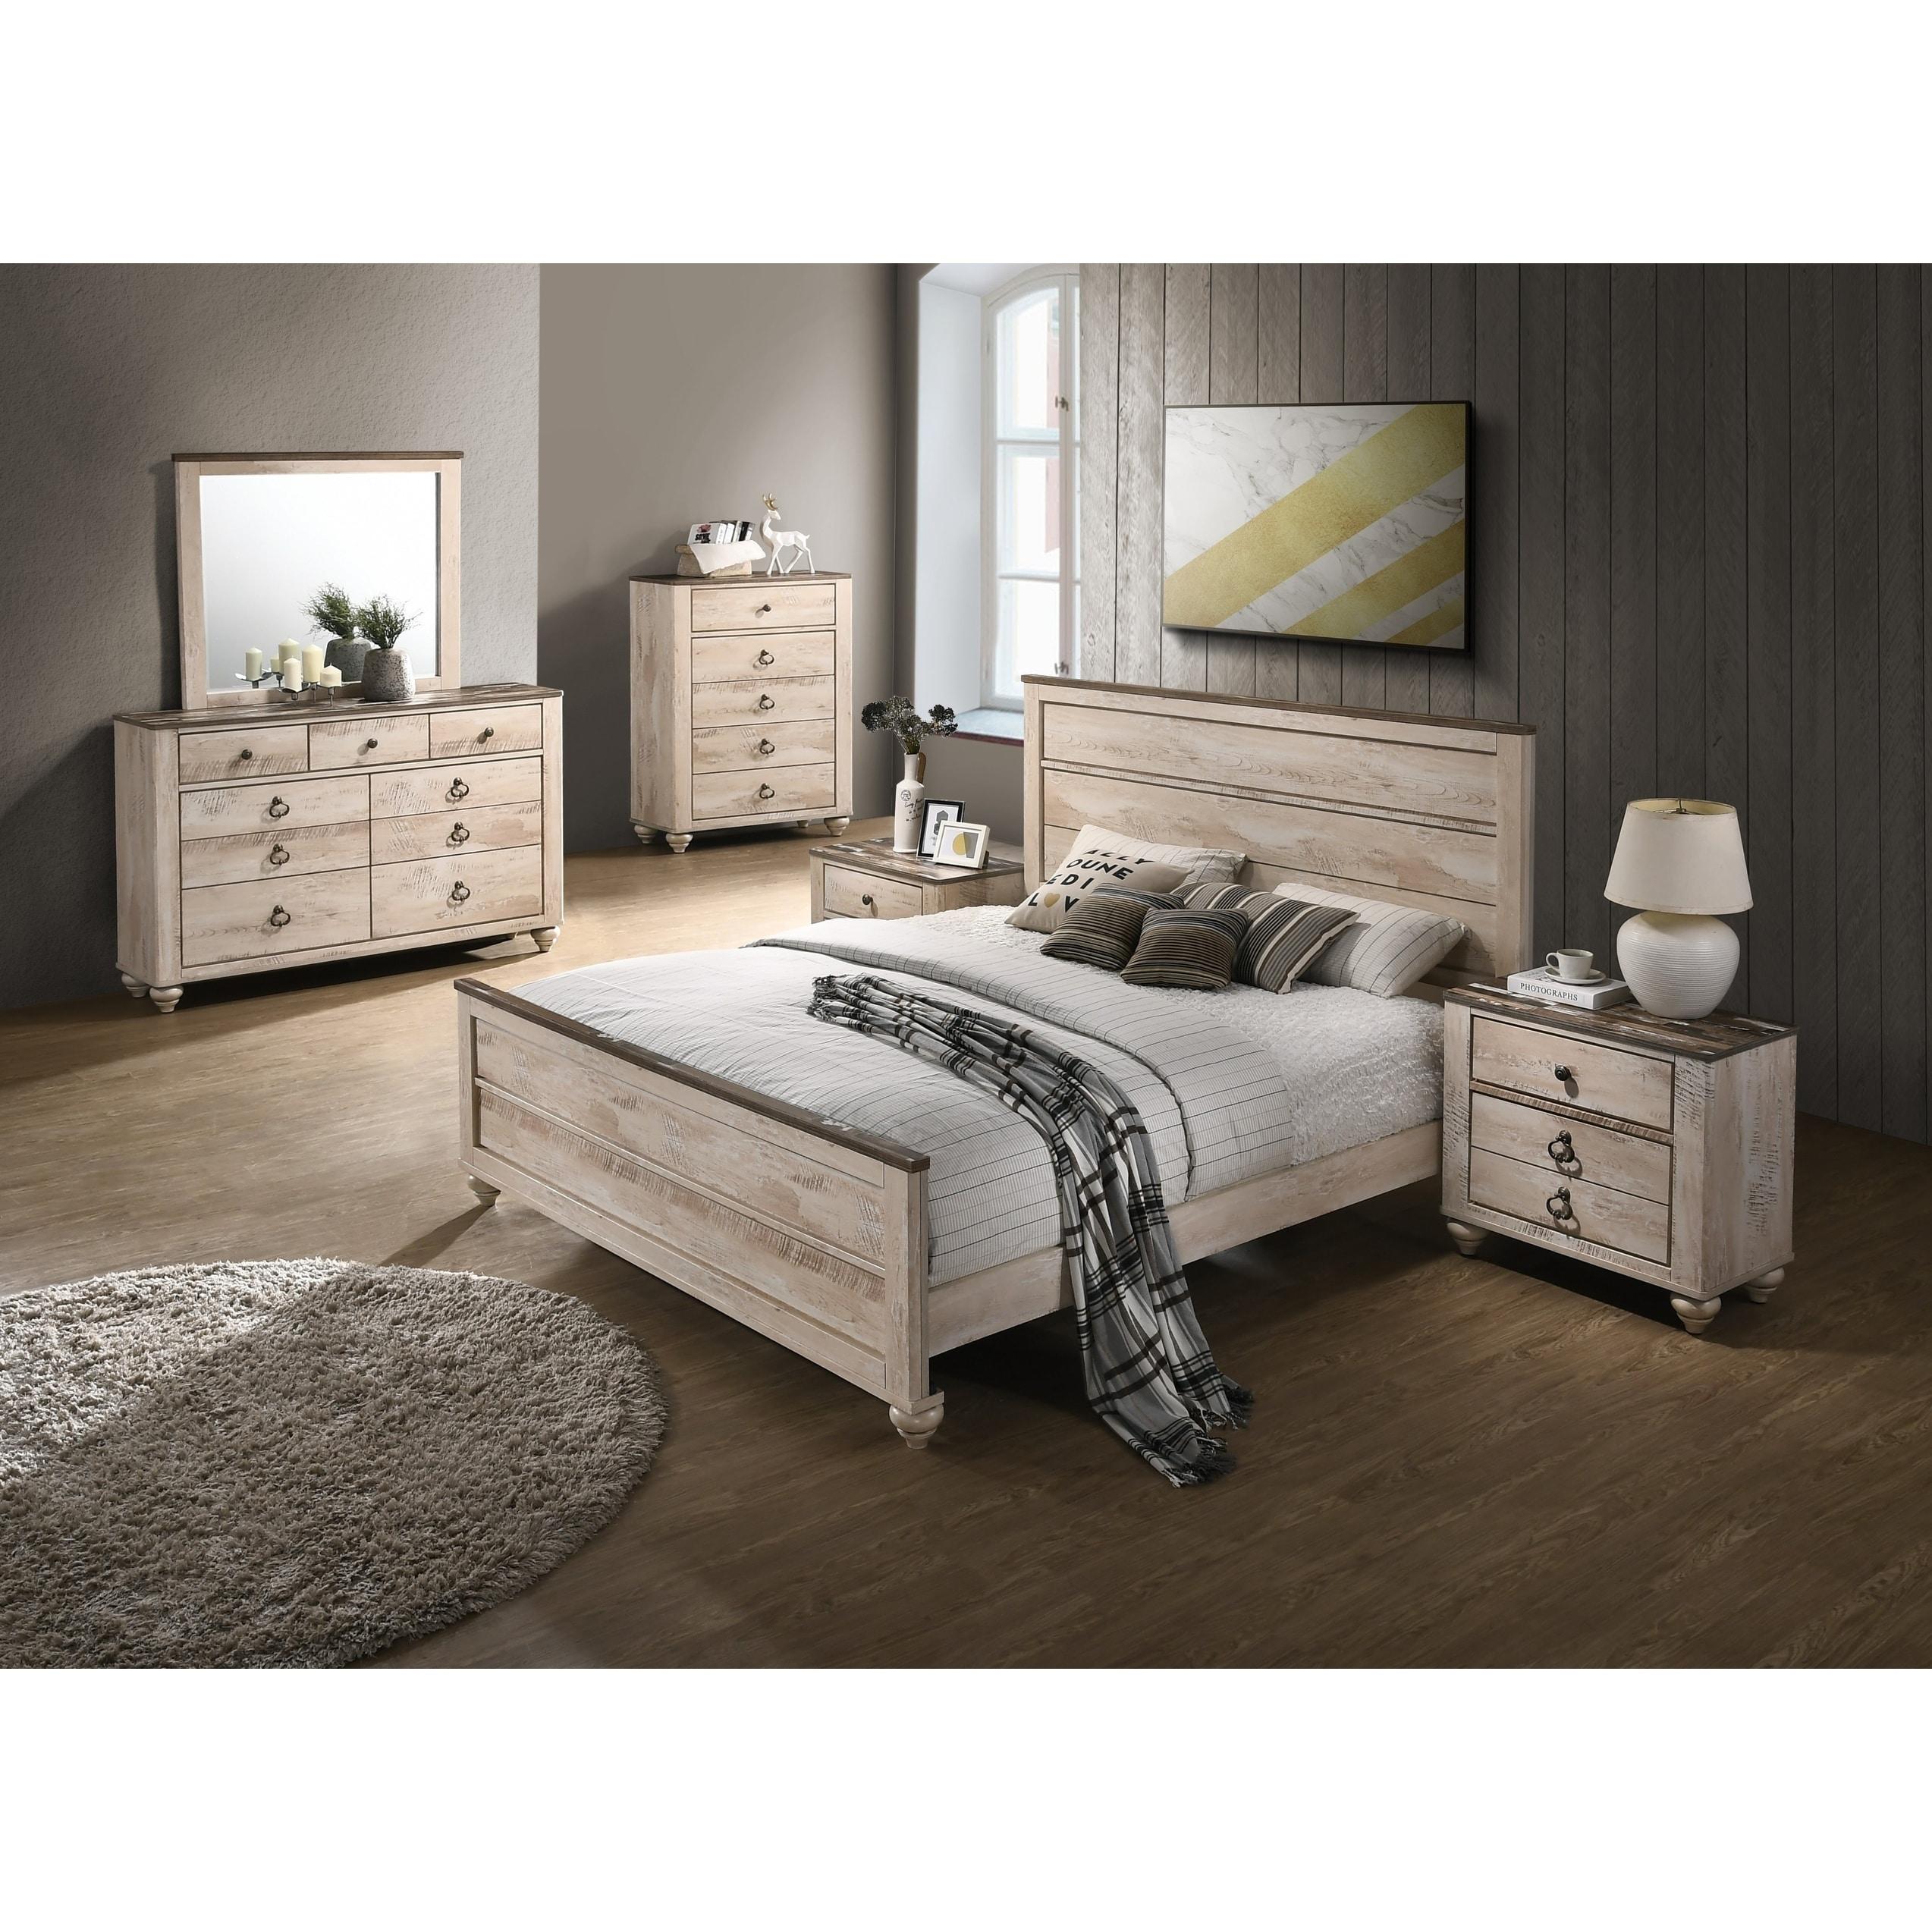 Imerland Contemporary White Wash Finish 6-Piece Bedroom Set, King